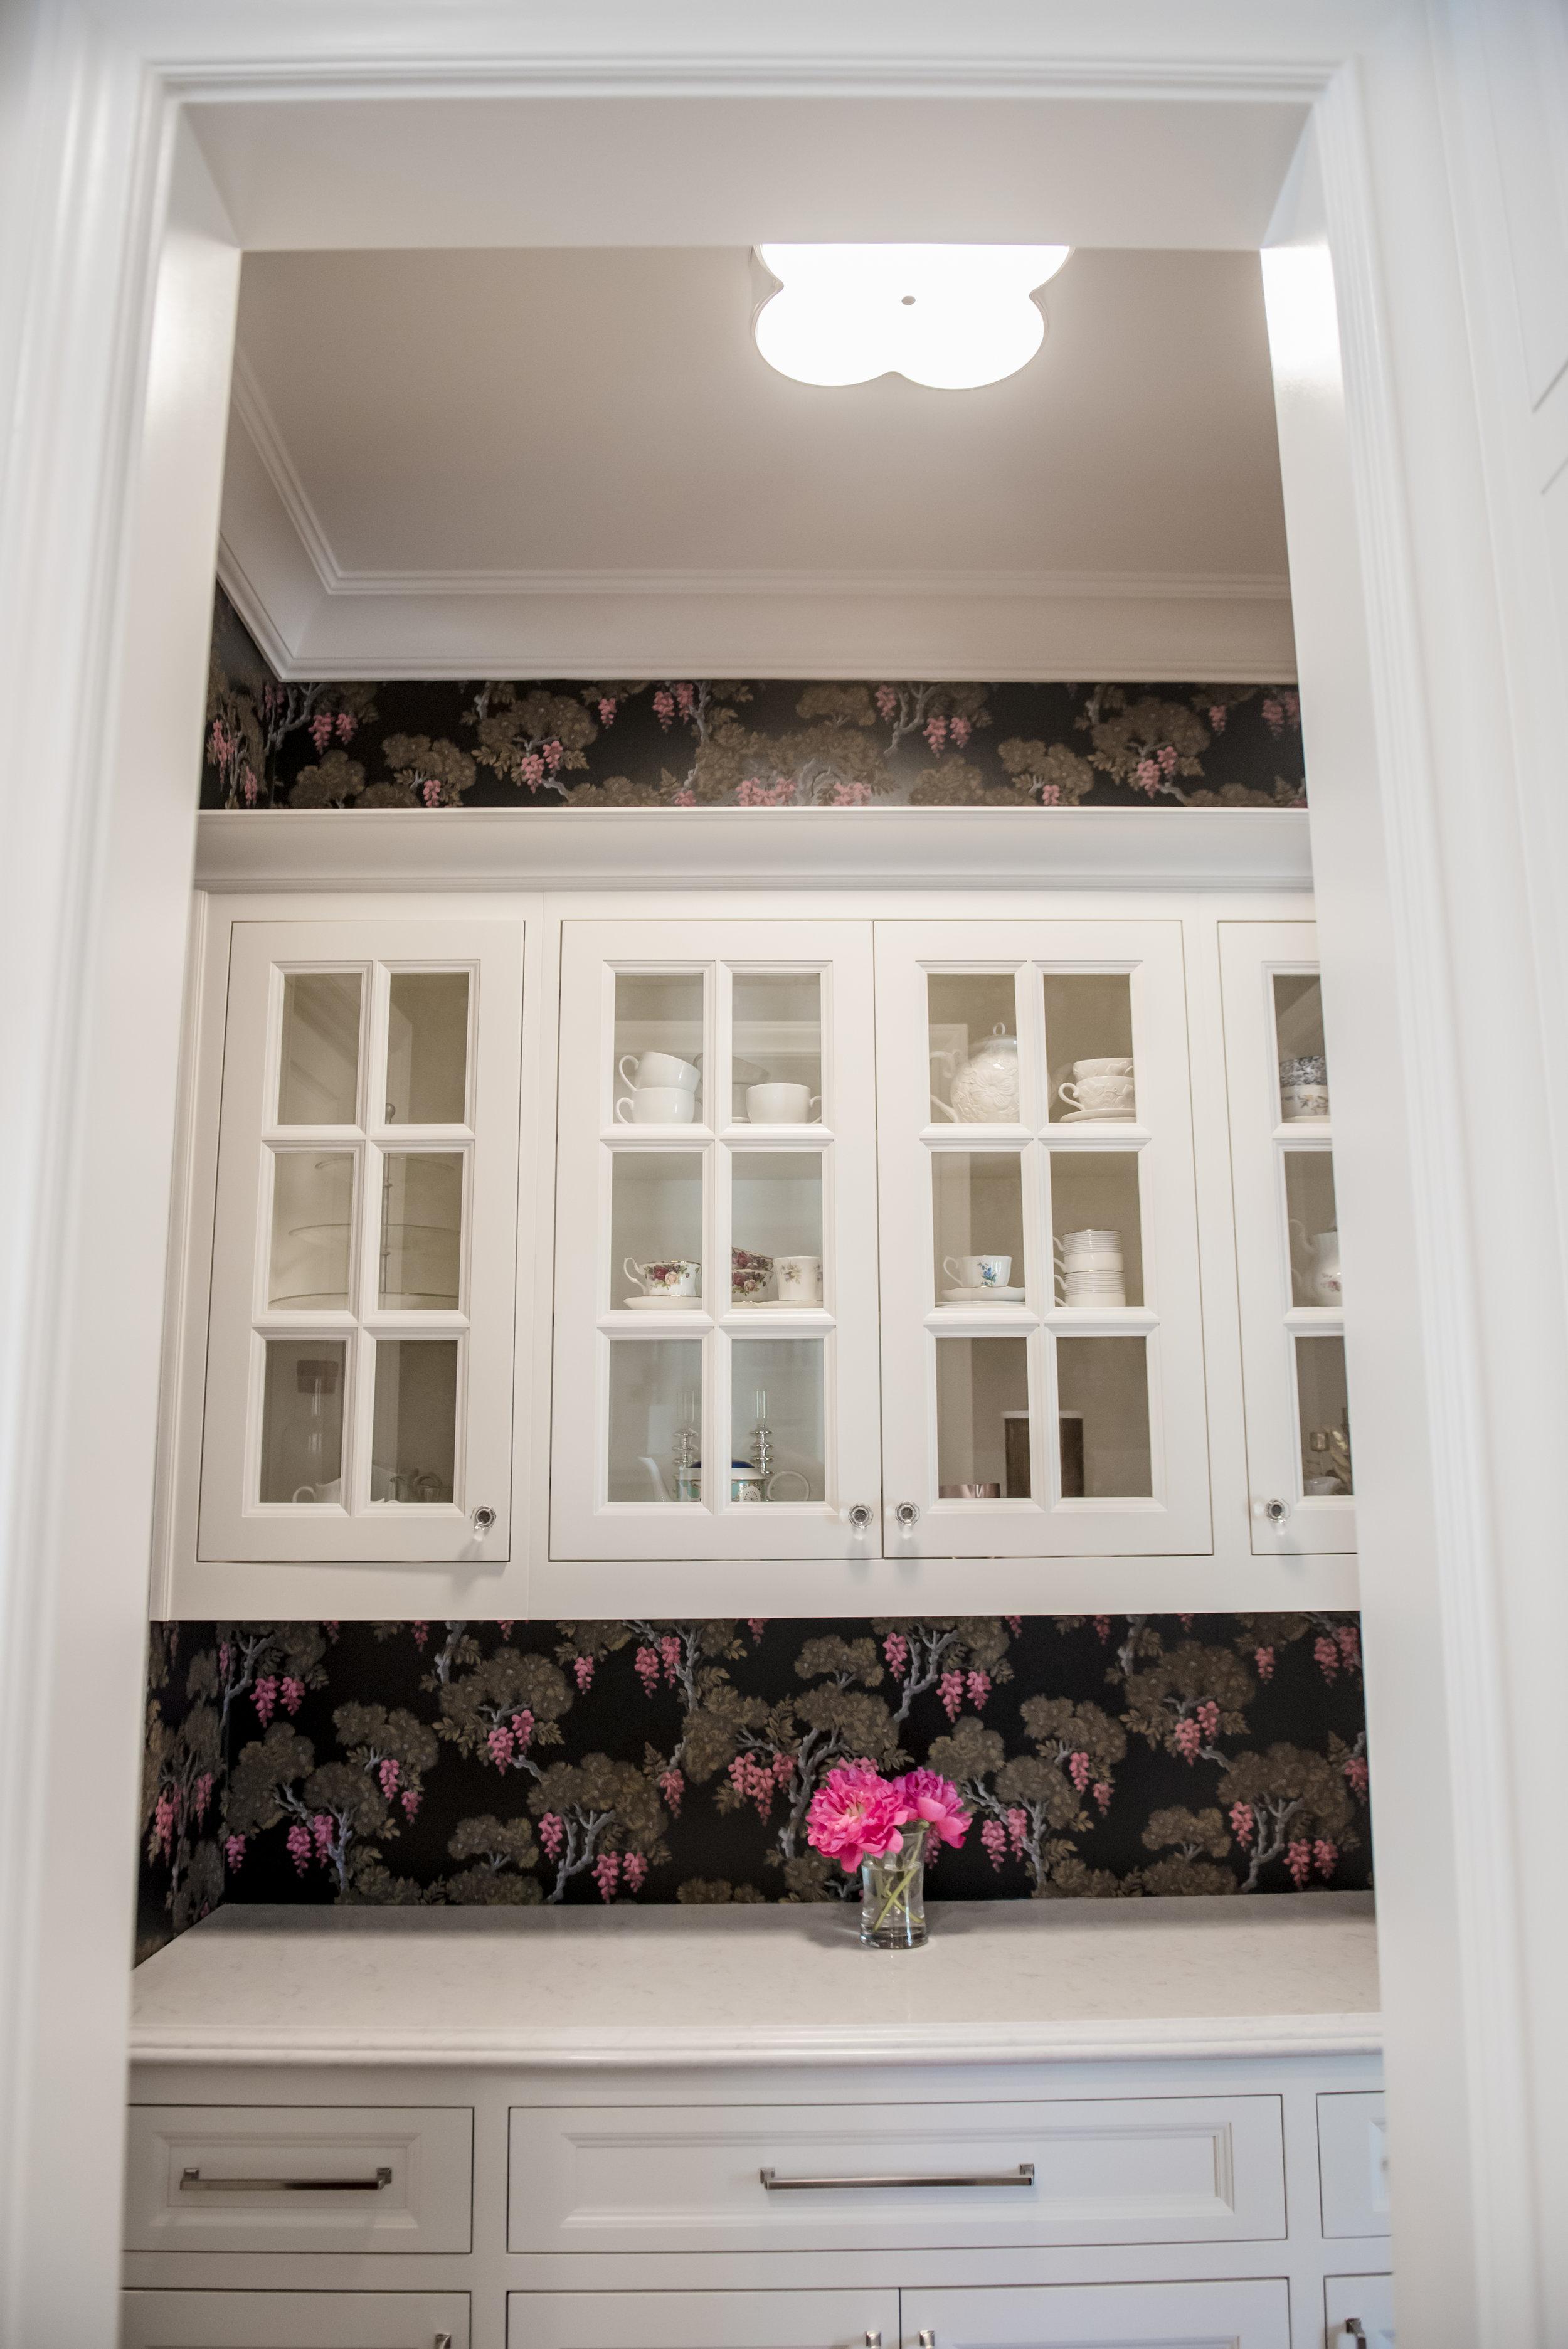 24+Butlers+Pantry+Wallpaper+Glasscabinets+Floral+Black+Bold.jpg